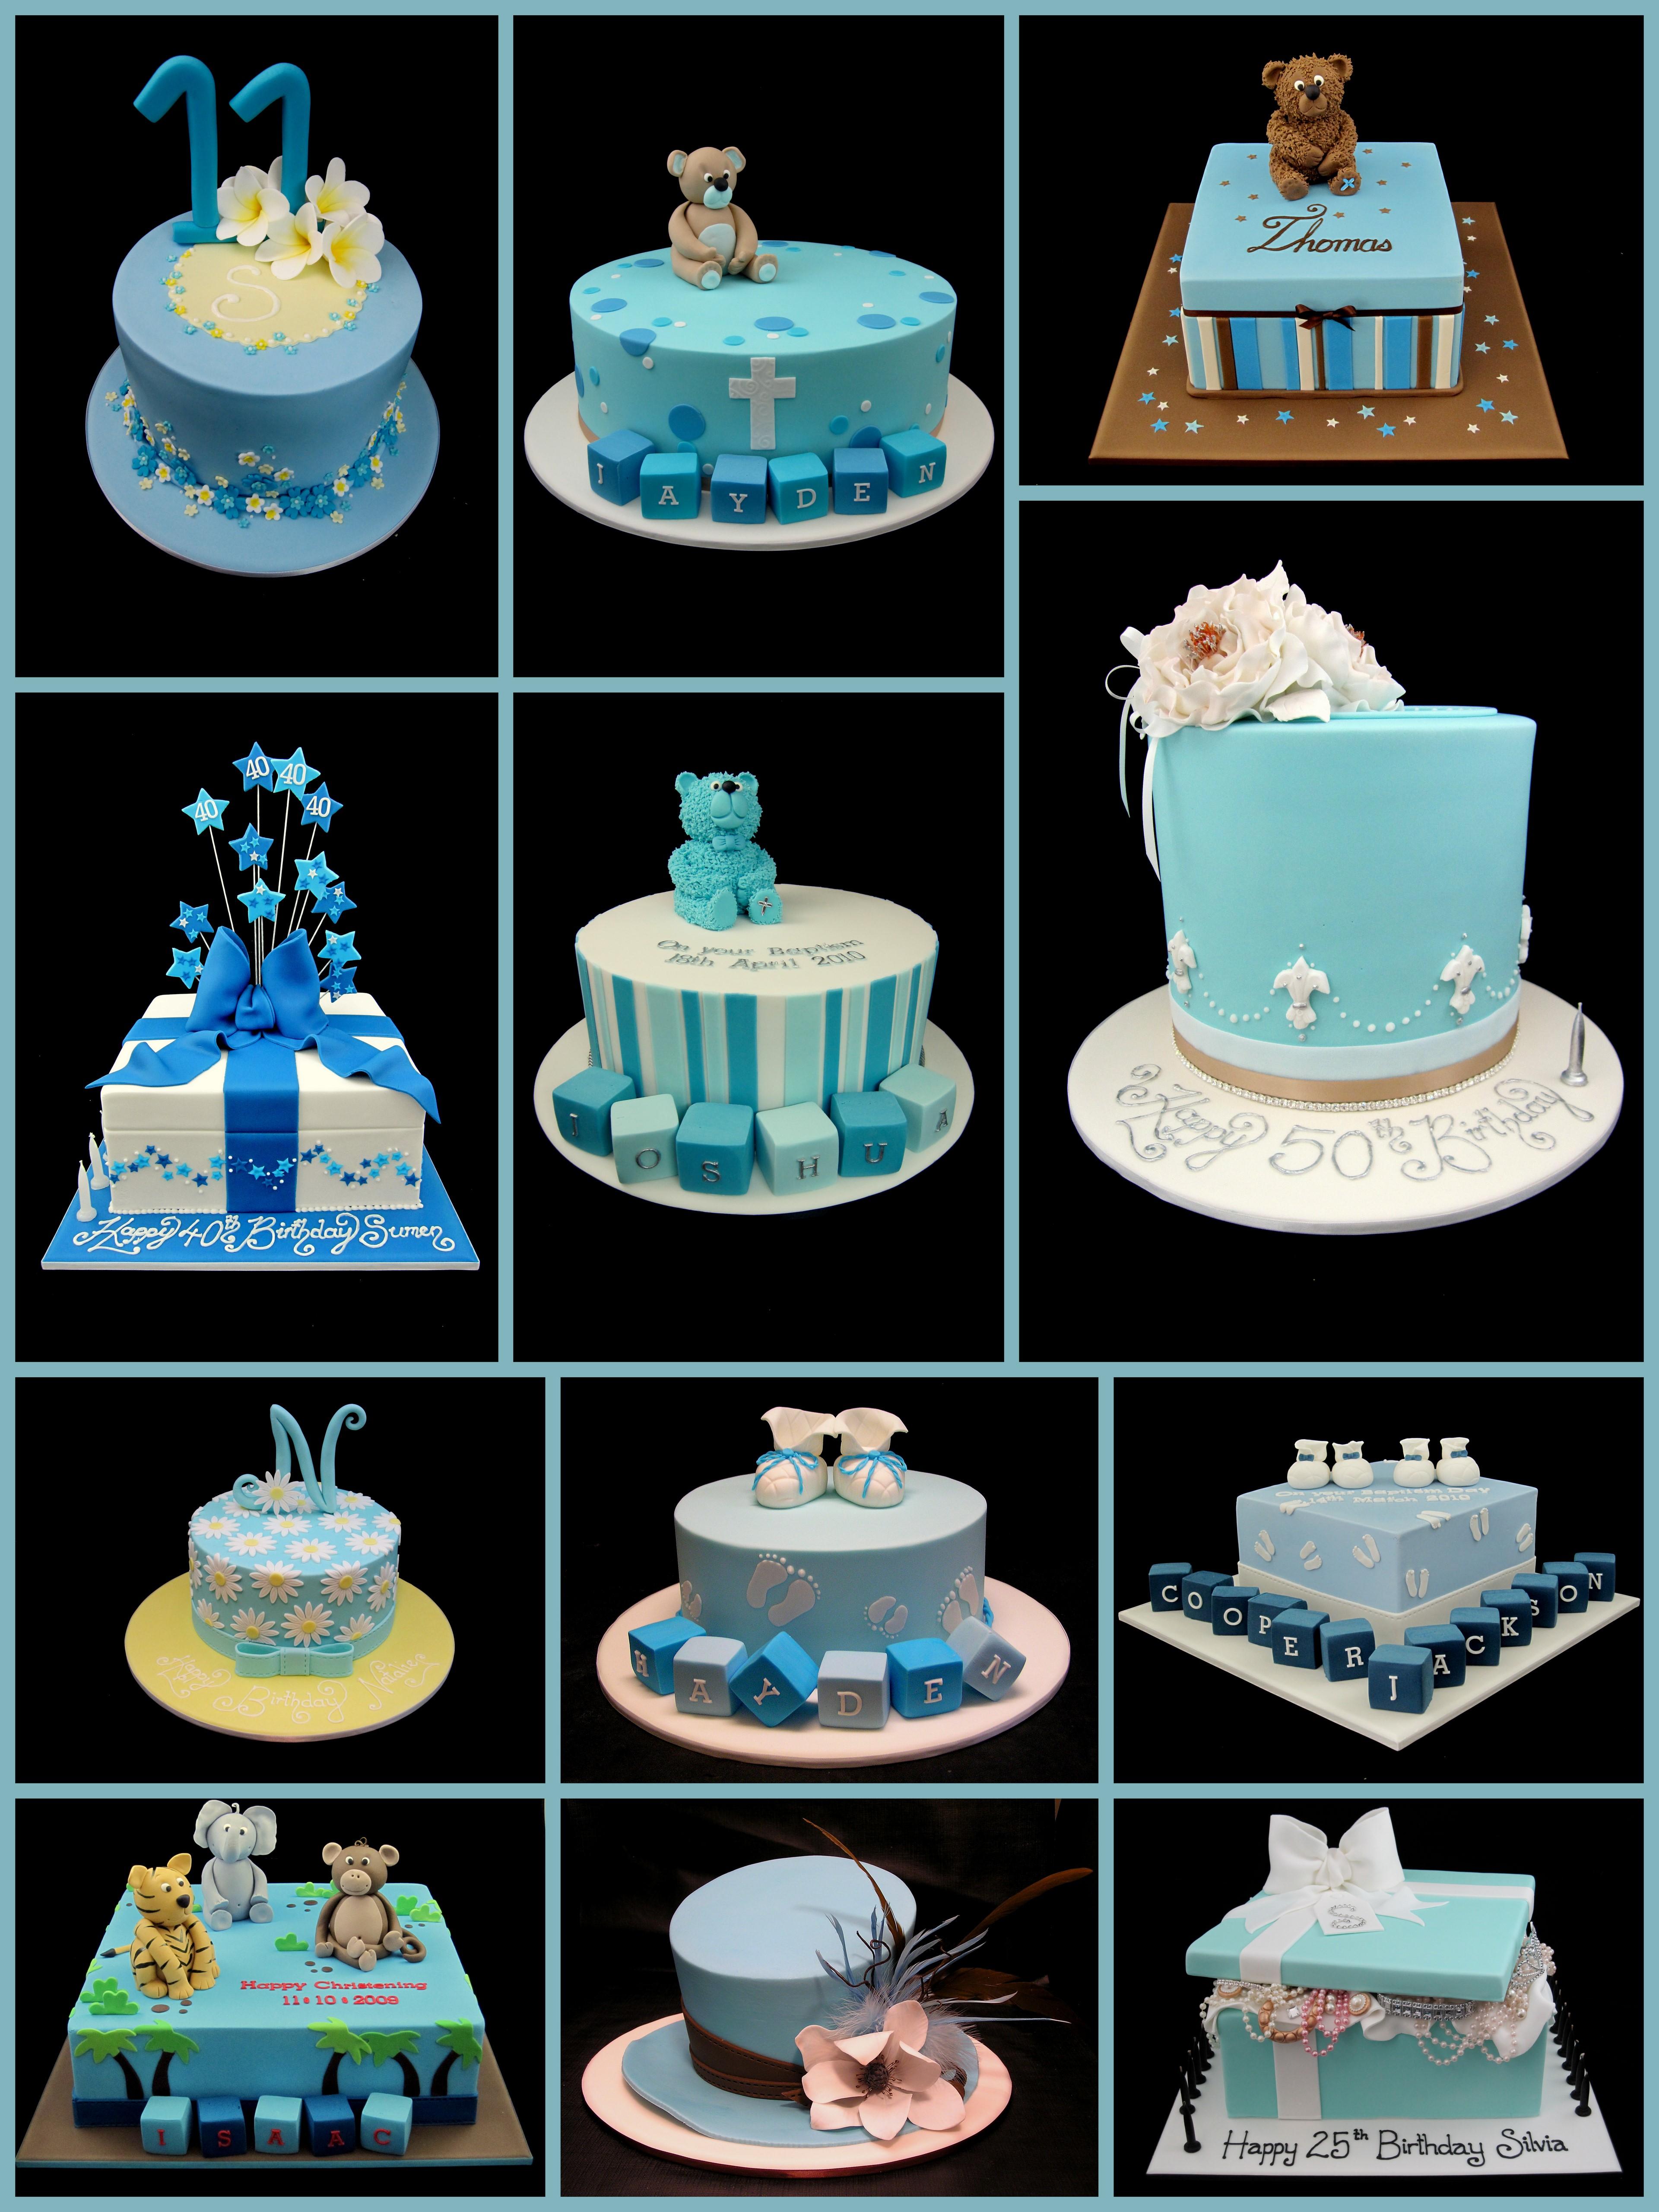 Cake Decorating Ideas for Boys